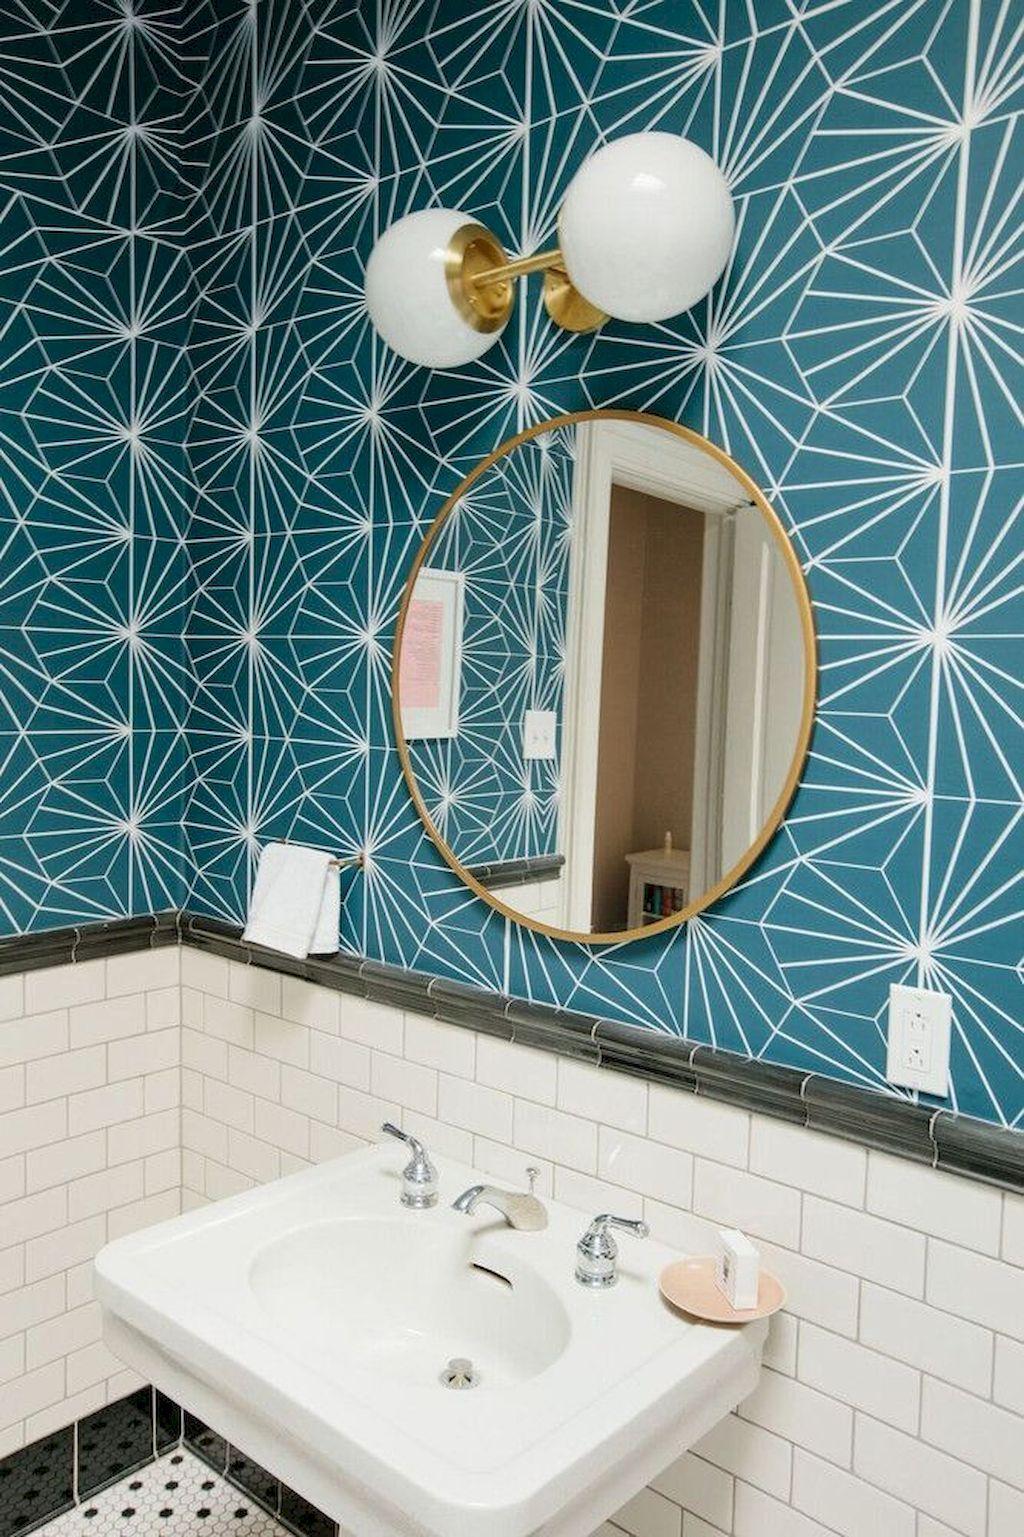 Bathroom Cheap Decor Guides In 50 Gallery Ideas Elonahome Com Diy Bathroom Design Teal Bathroom Art Deco Bathroom